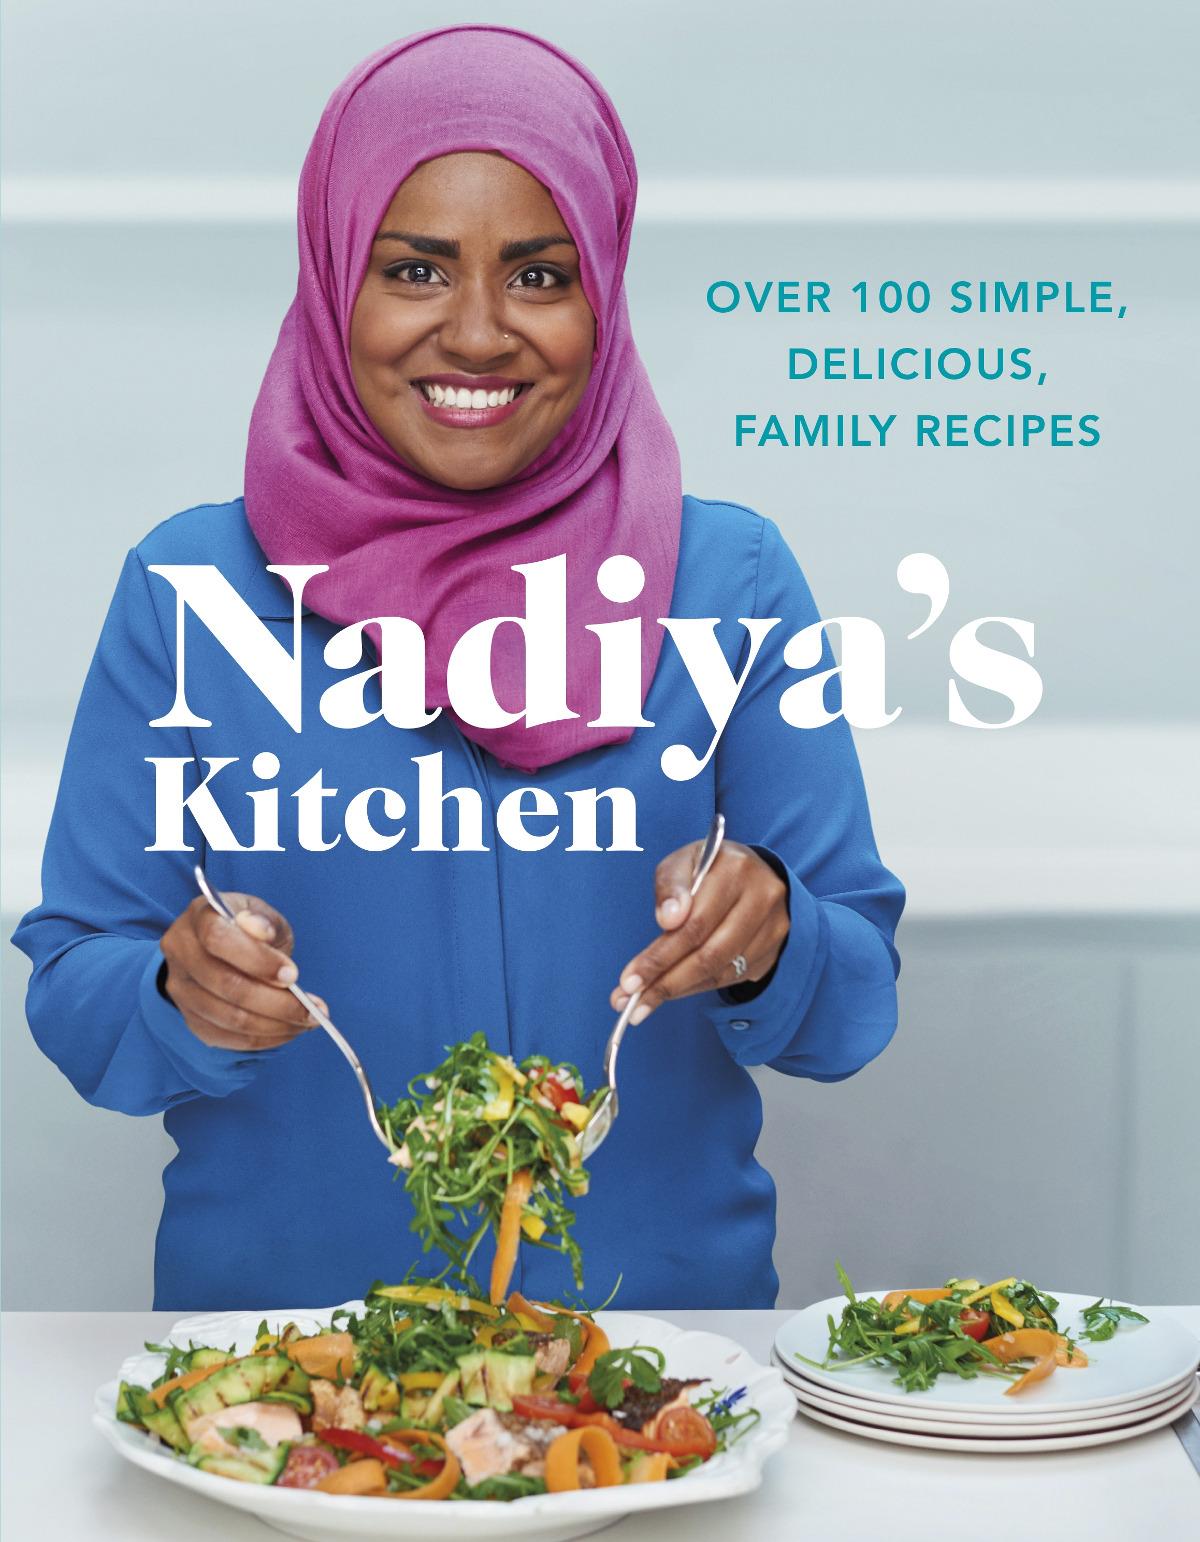 Nadiya Hussain Recipes